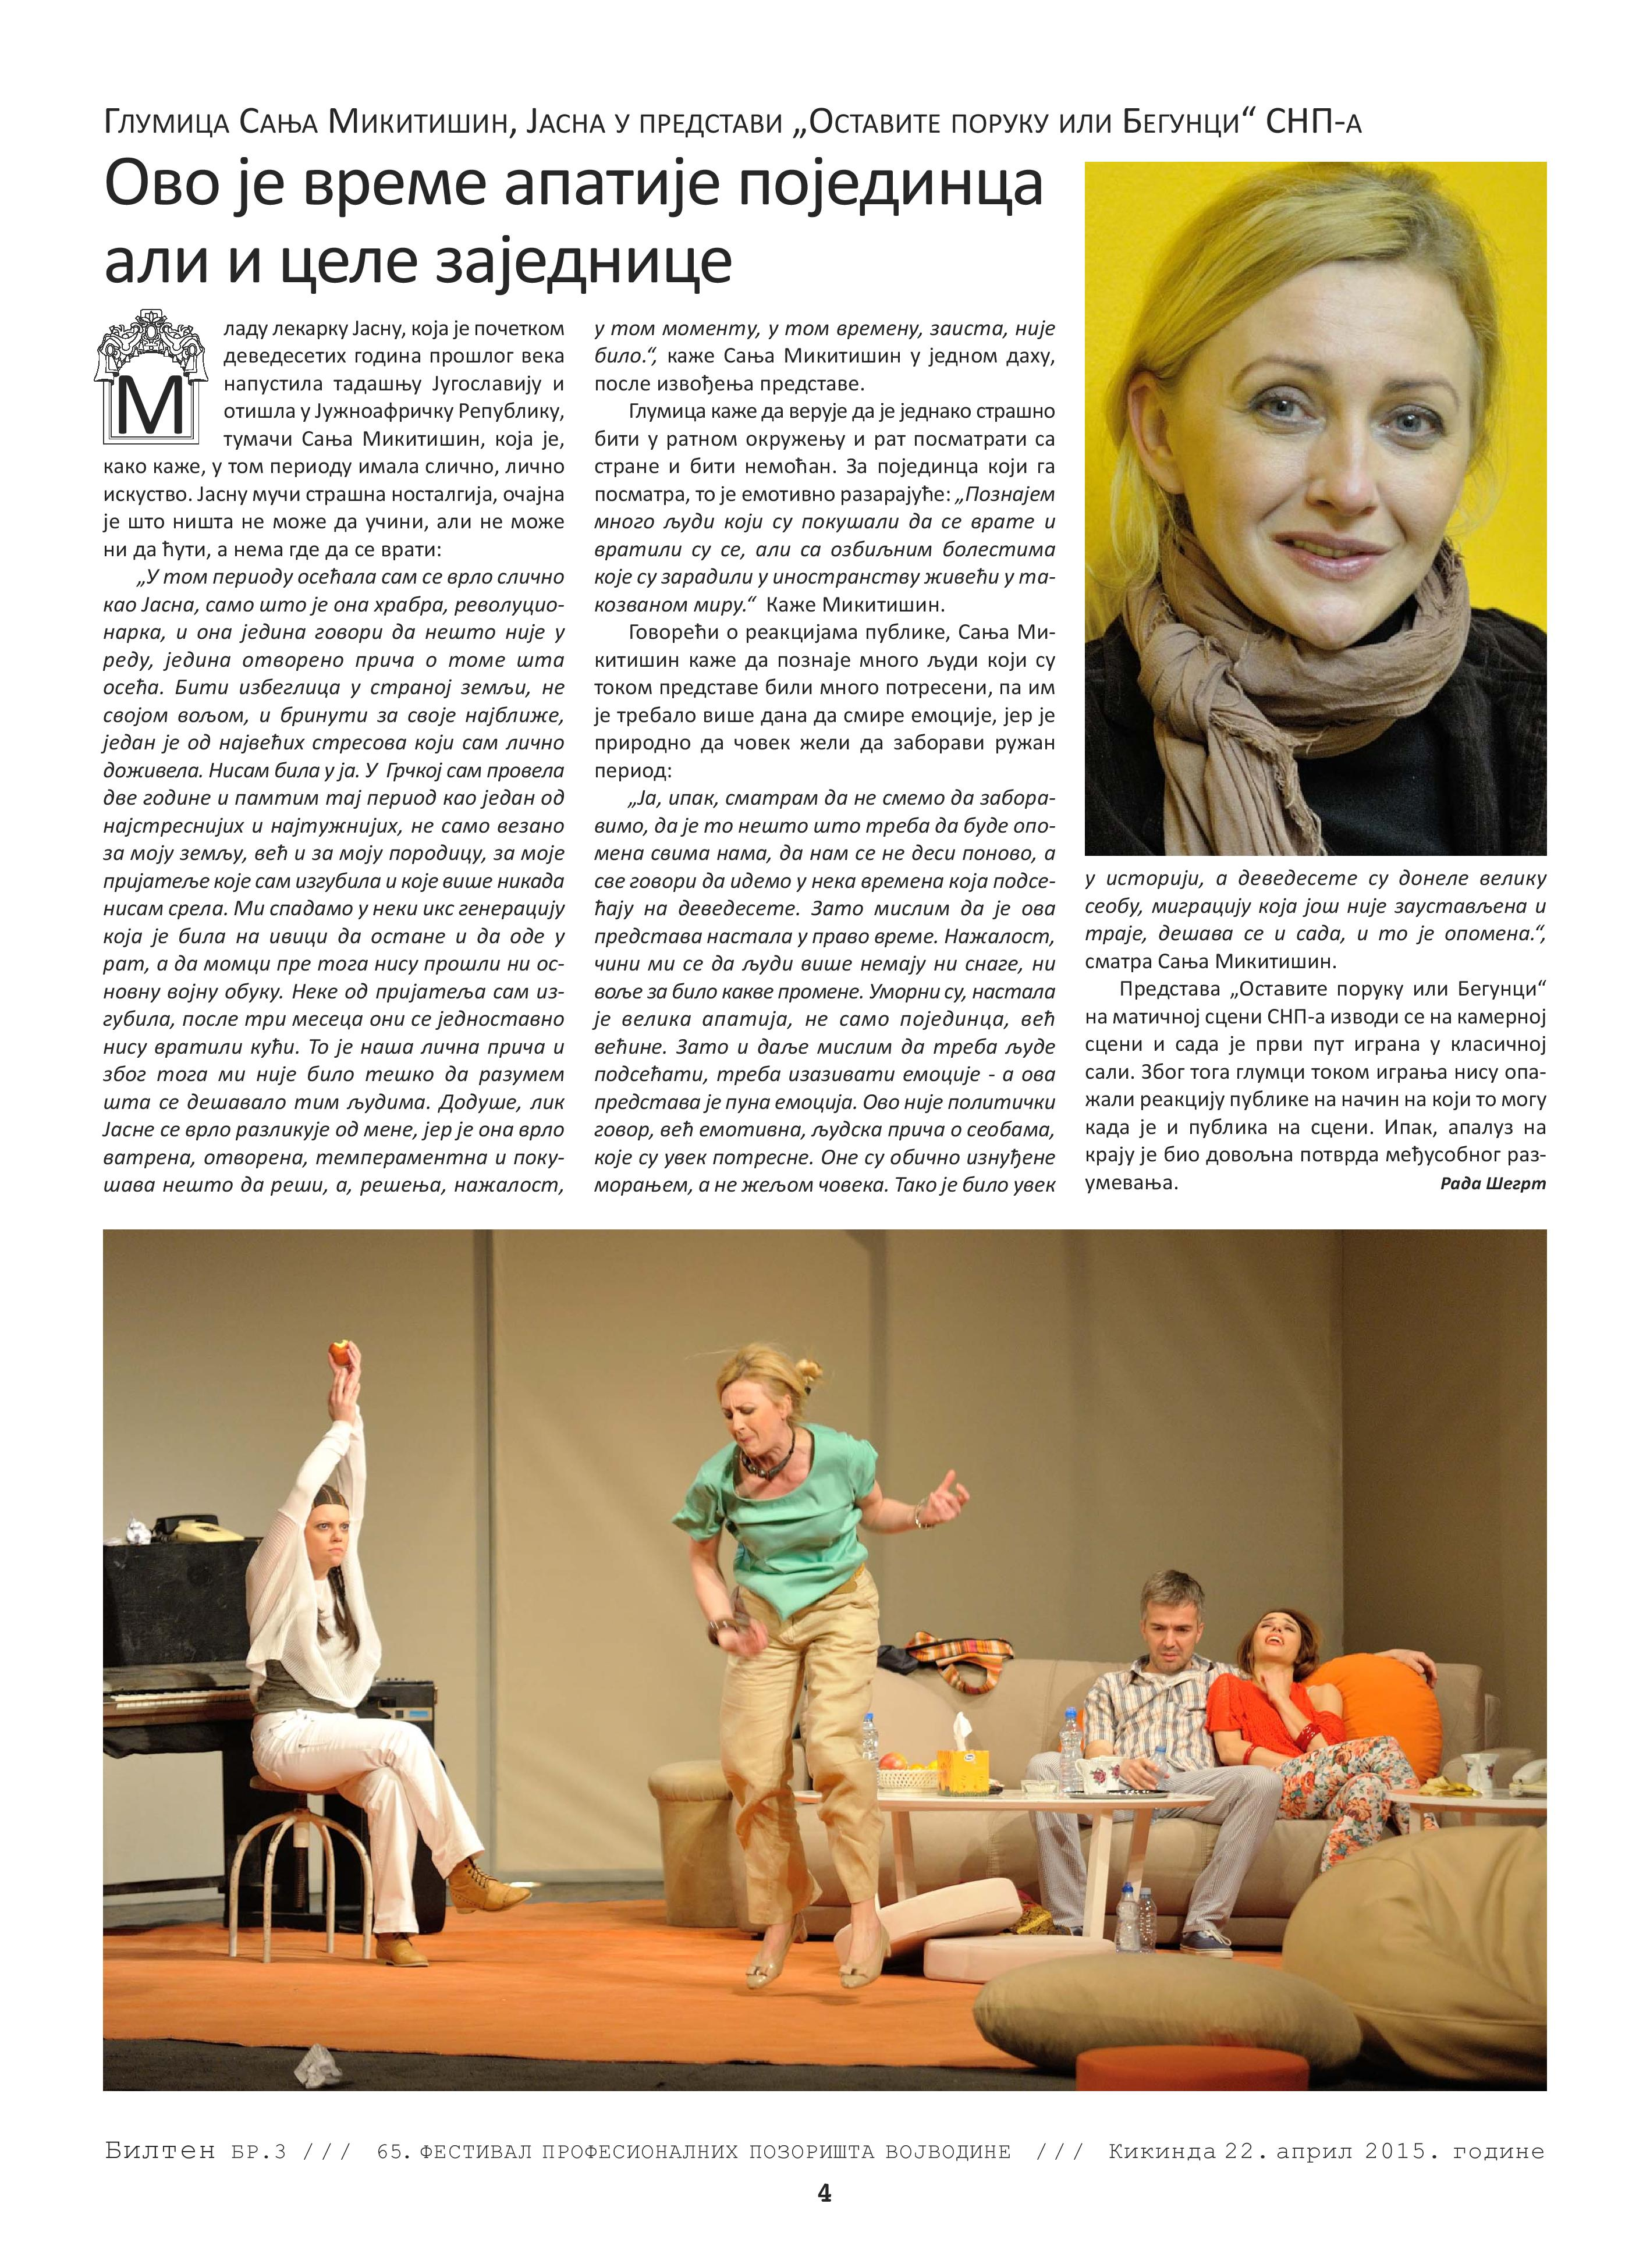 BILTEN_03_22 april-page-004